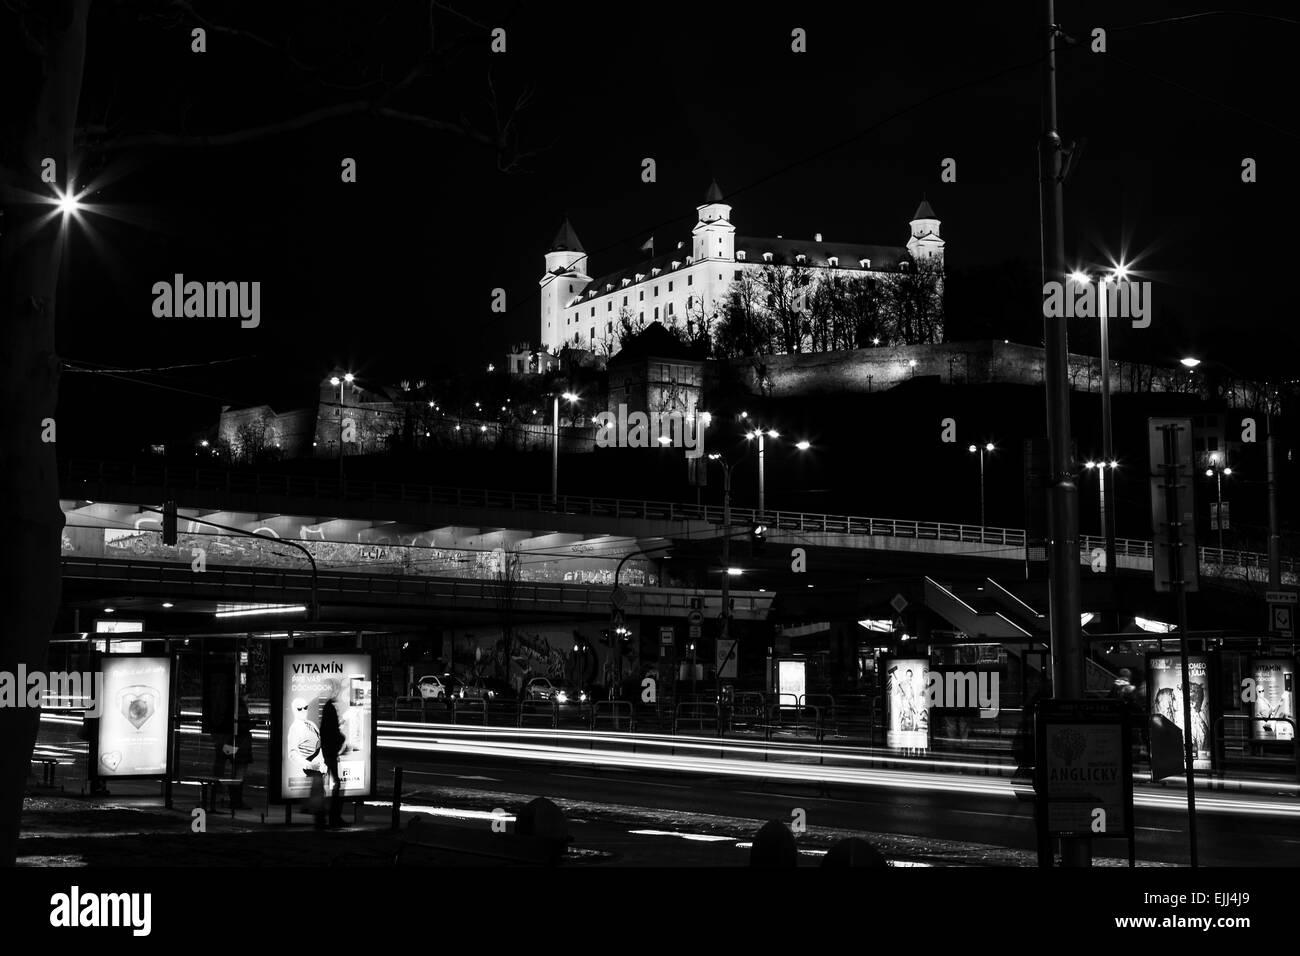 UFO Bridge in Bratislava during the hours of darkness. - Stock Image